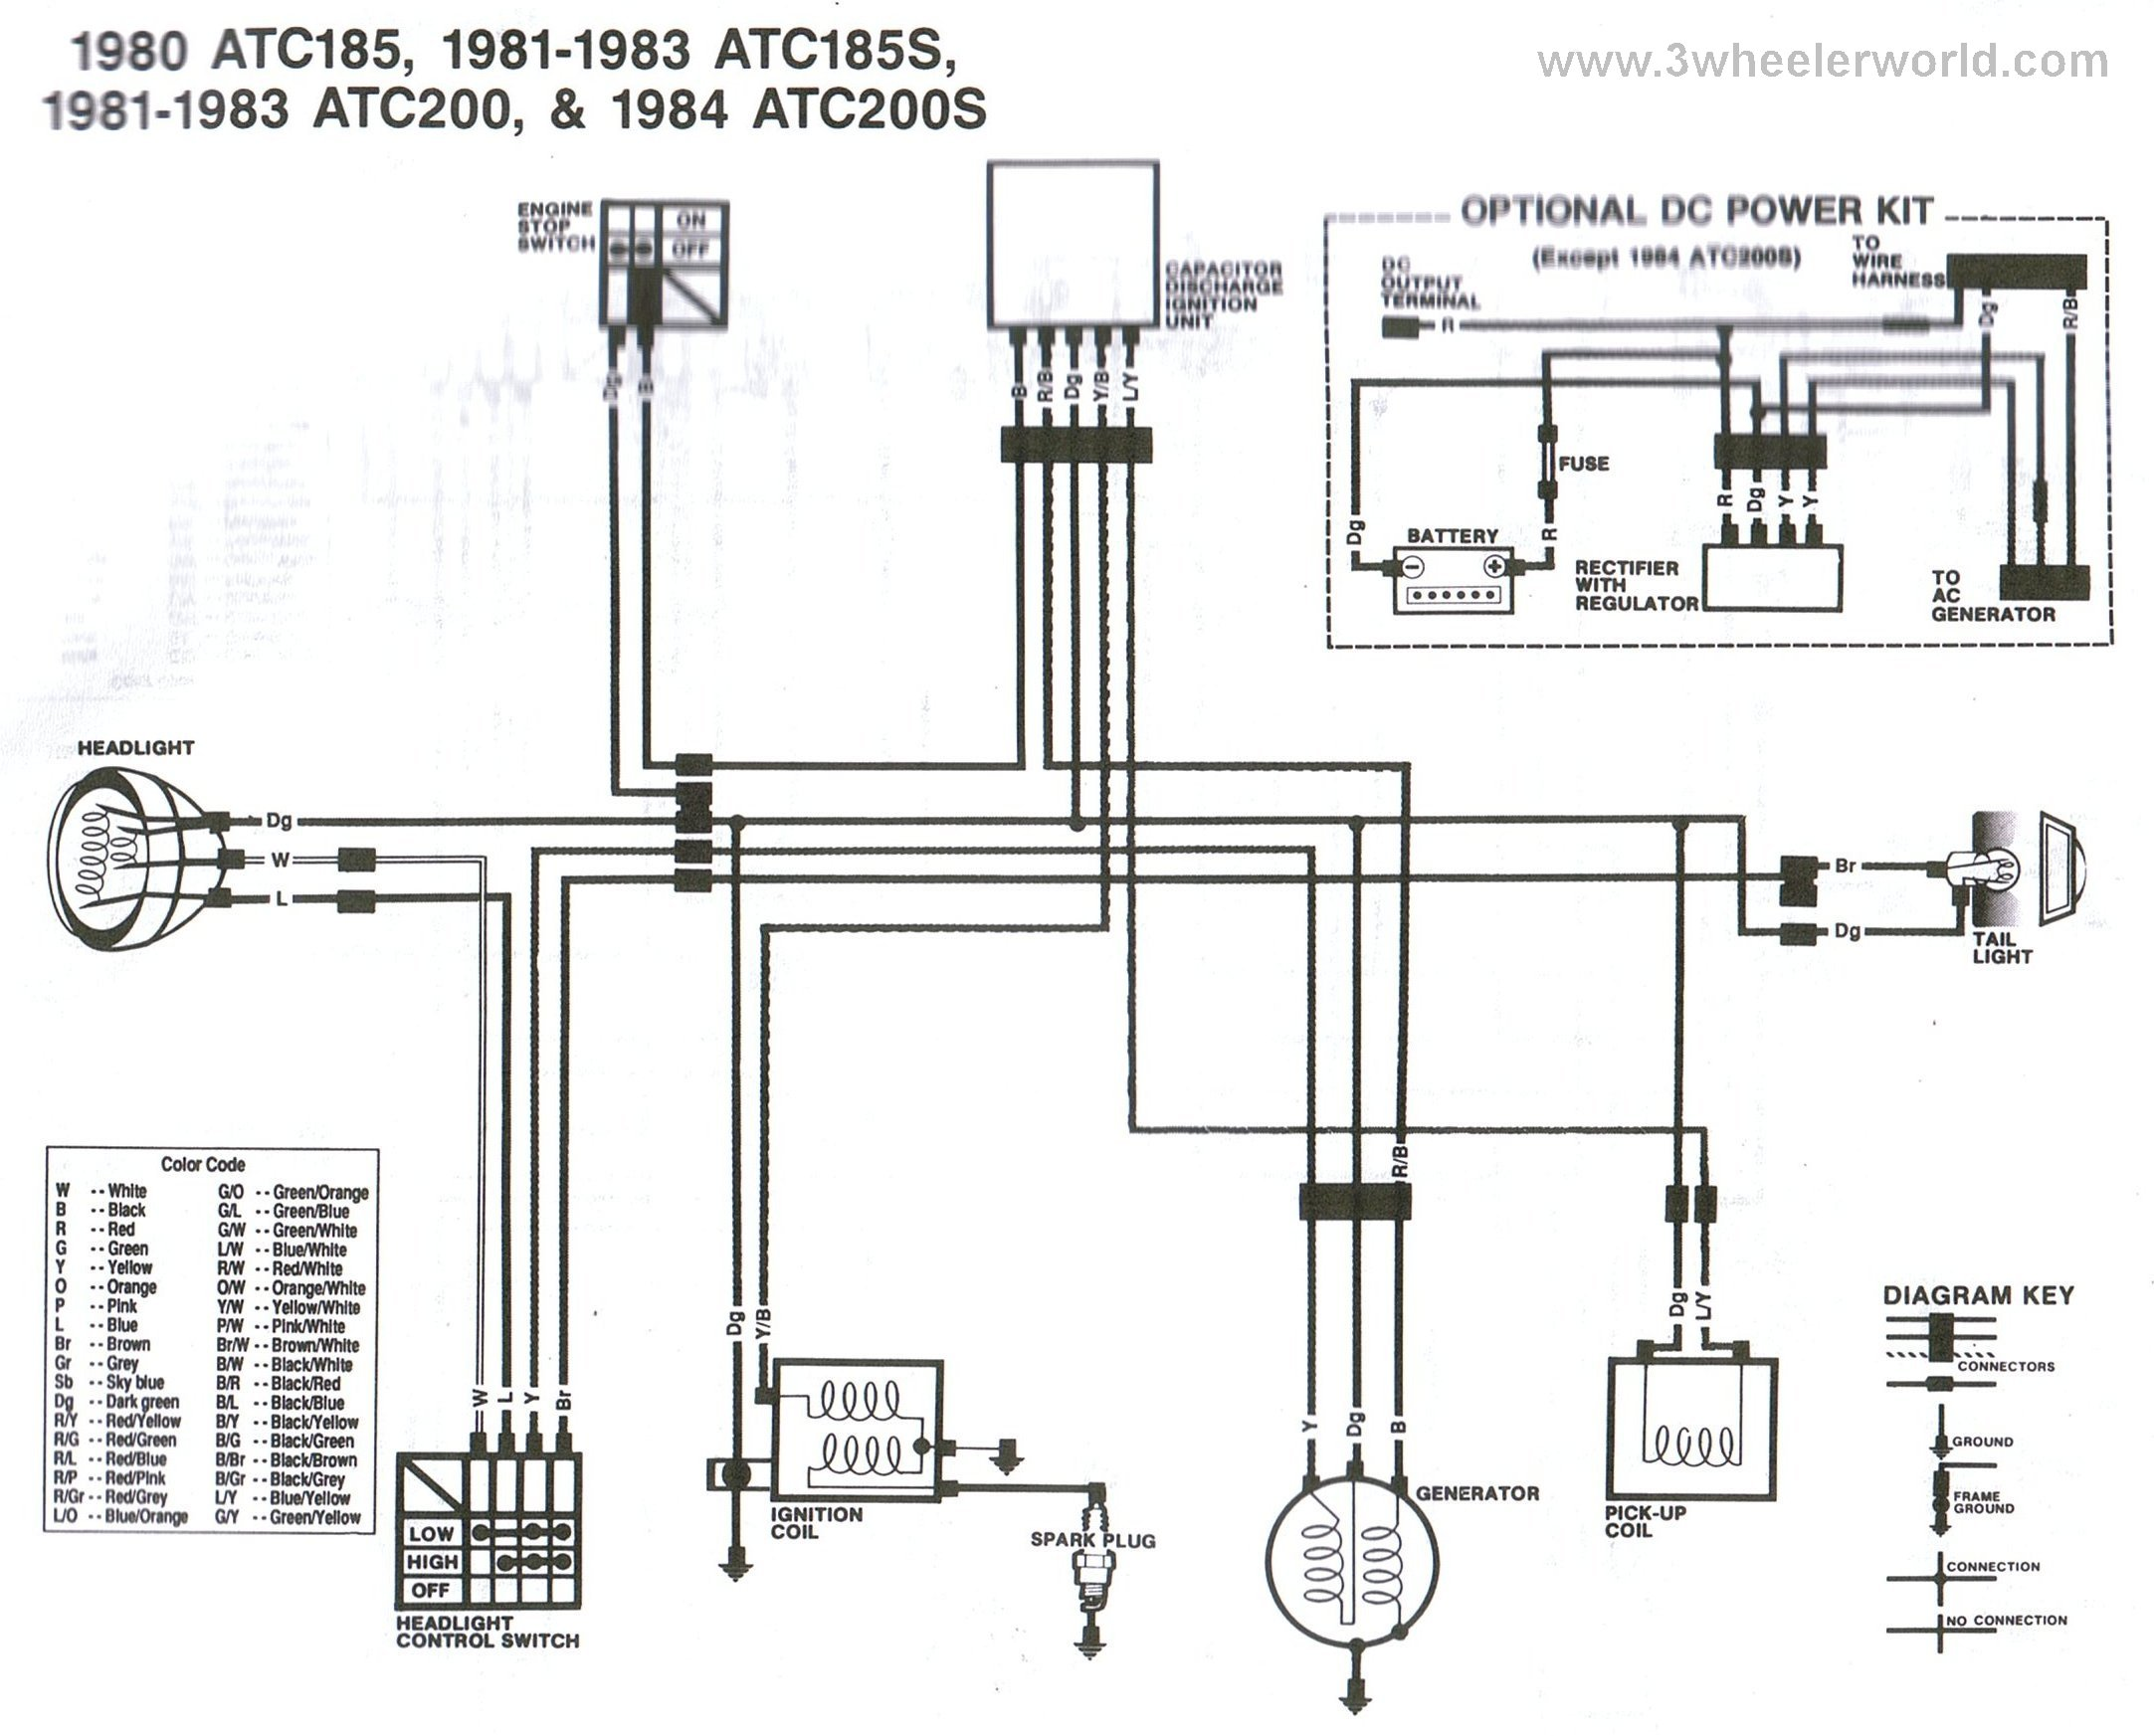 1990 honda fourtrax 300 wiring diagram thrust stage detailed 90 data atc we 350 200e